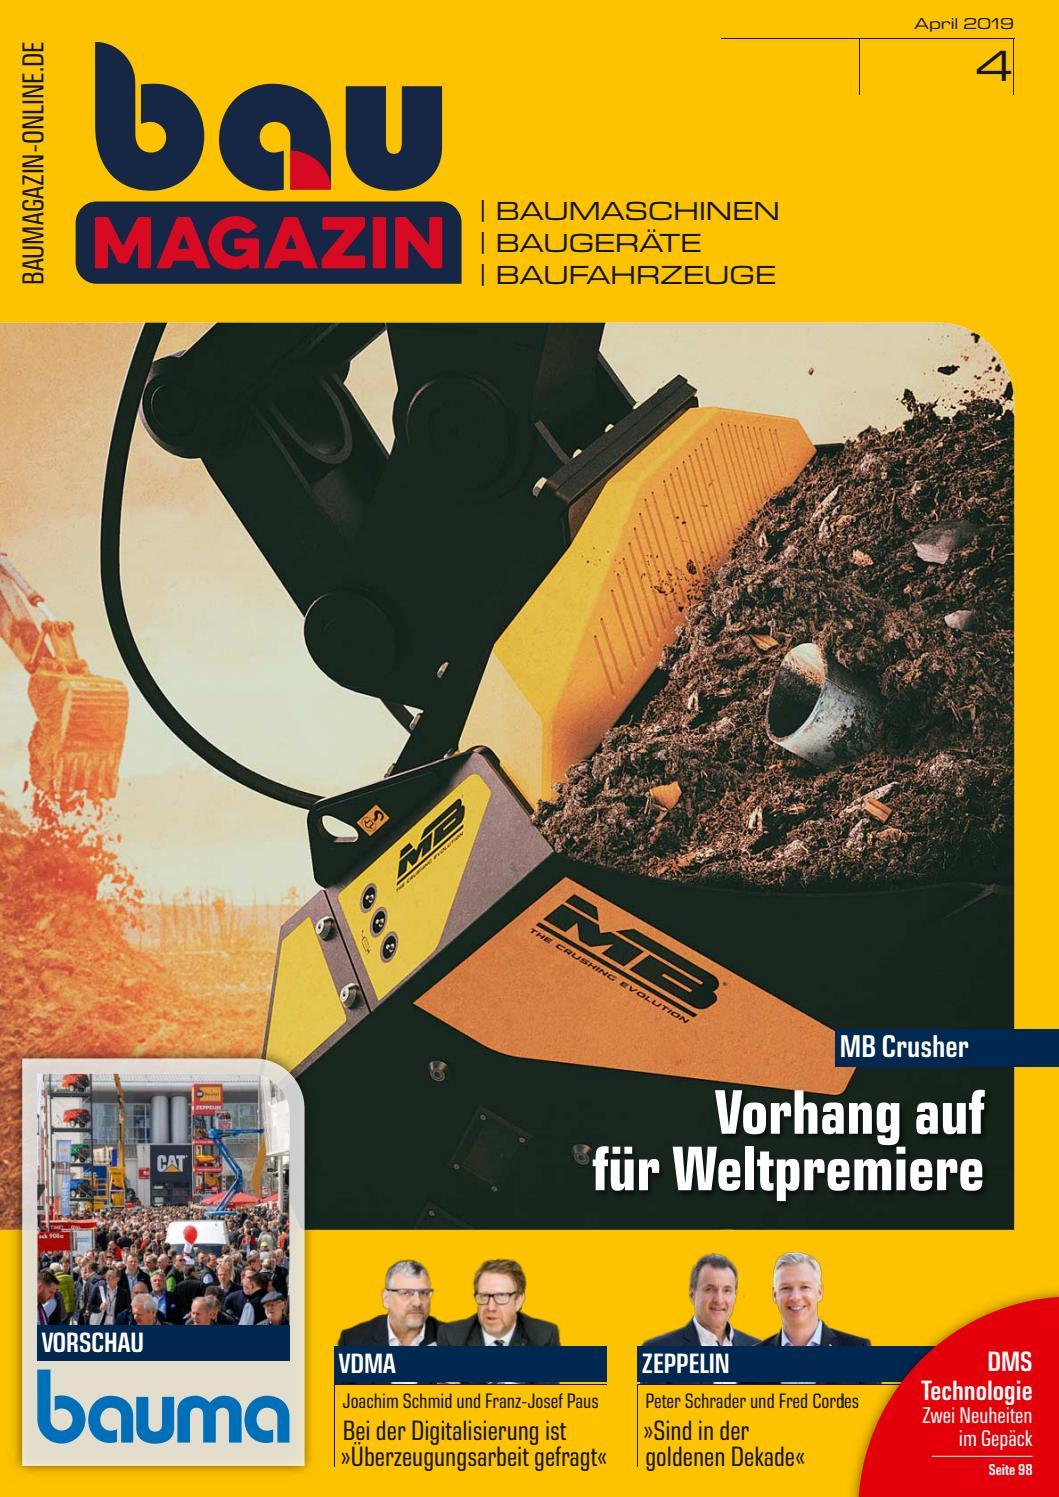 Baumagazin April 2019 By Sbm Verlag Gmbh - Issuu avec Bz 120 Cm But